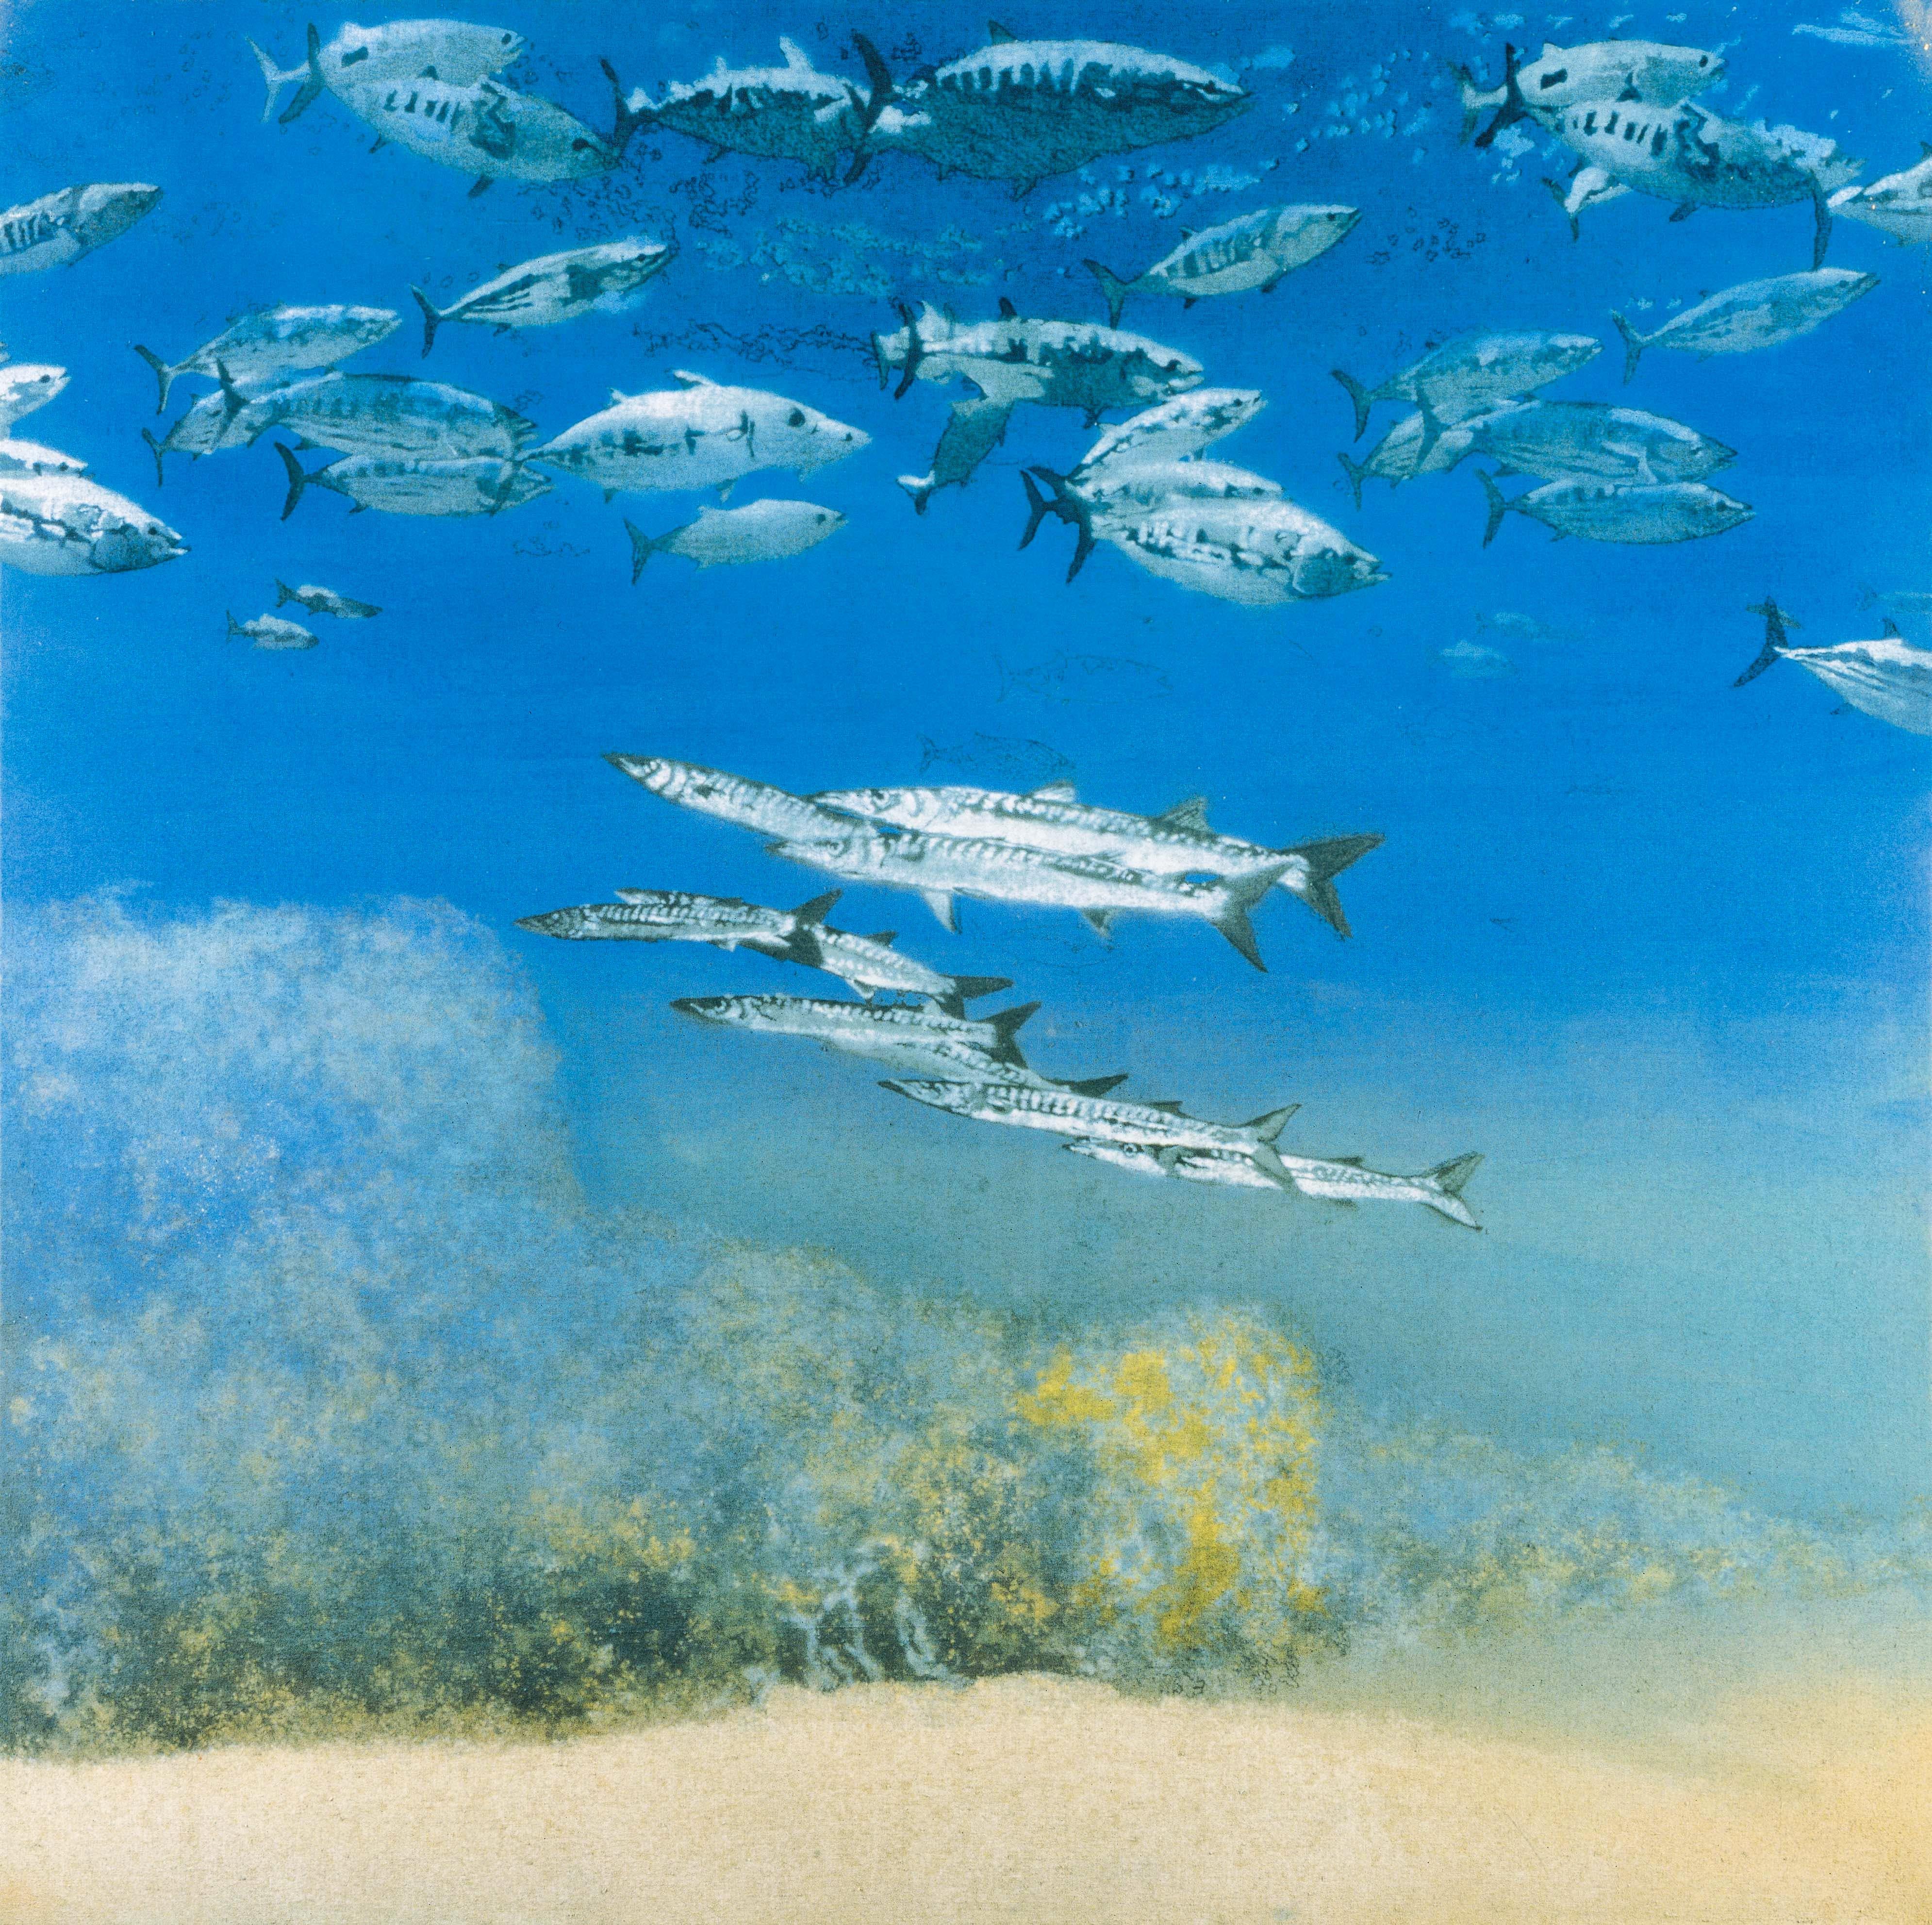 School IV: Barracuda under Skipjack Tuna (1978), Michael Andrews